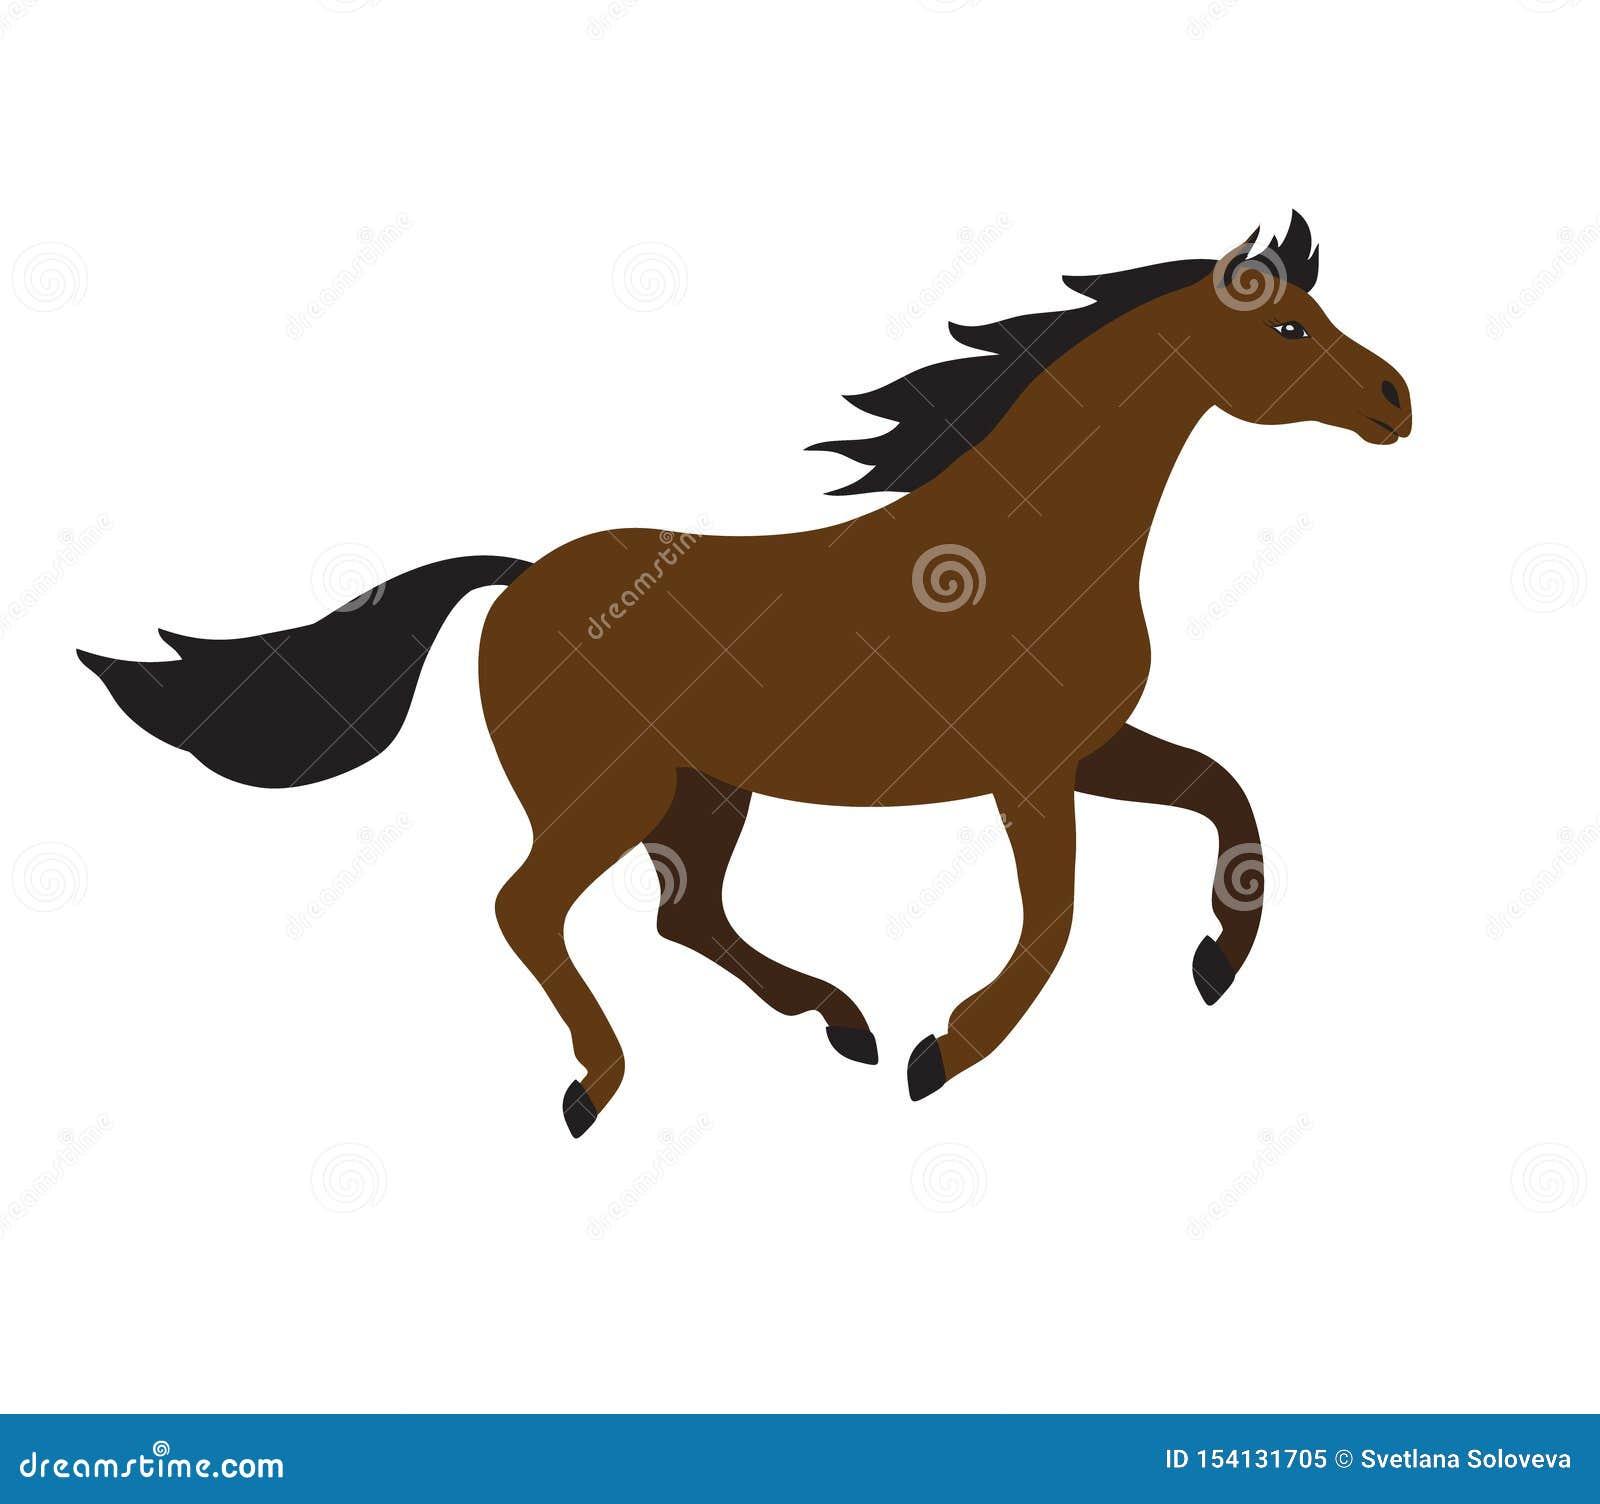 galloping cartoon horse stock illustrations – 470 galloping cartoon horse  stock illustrations, vectors & clipart - dreamstime  dreamstime.com